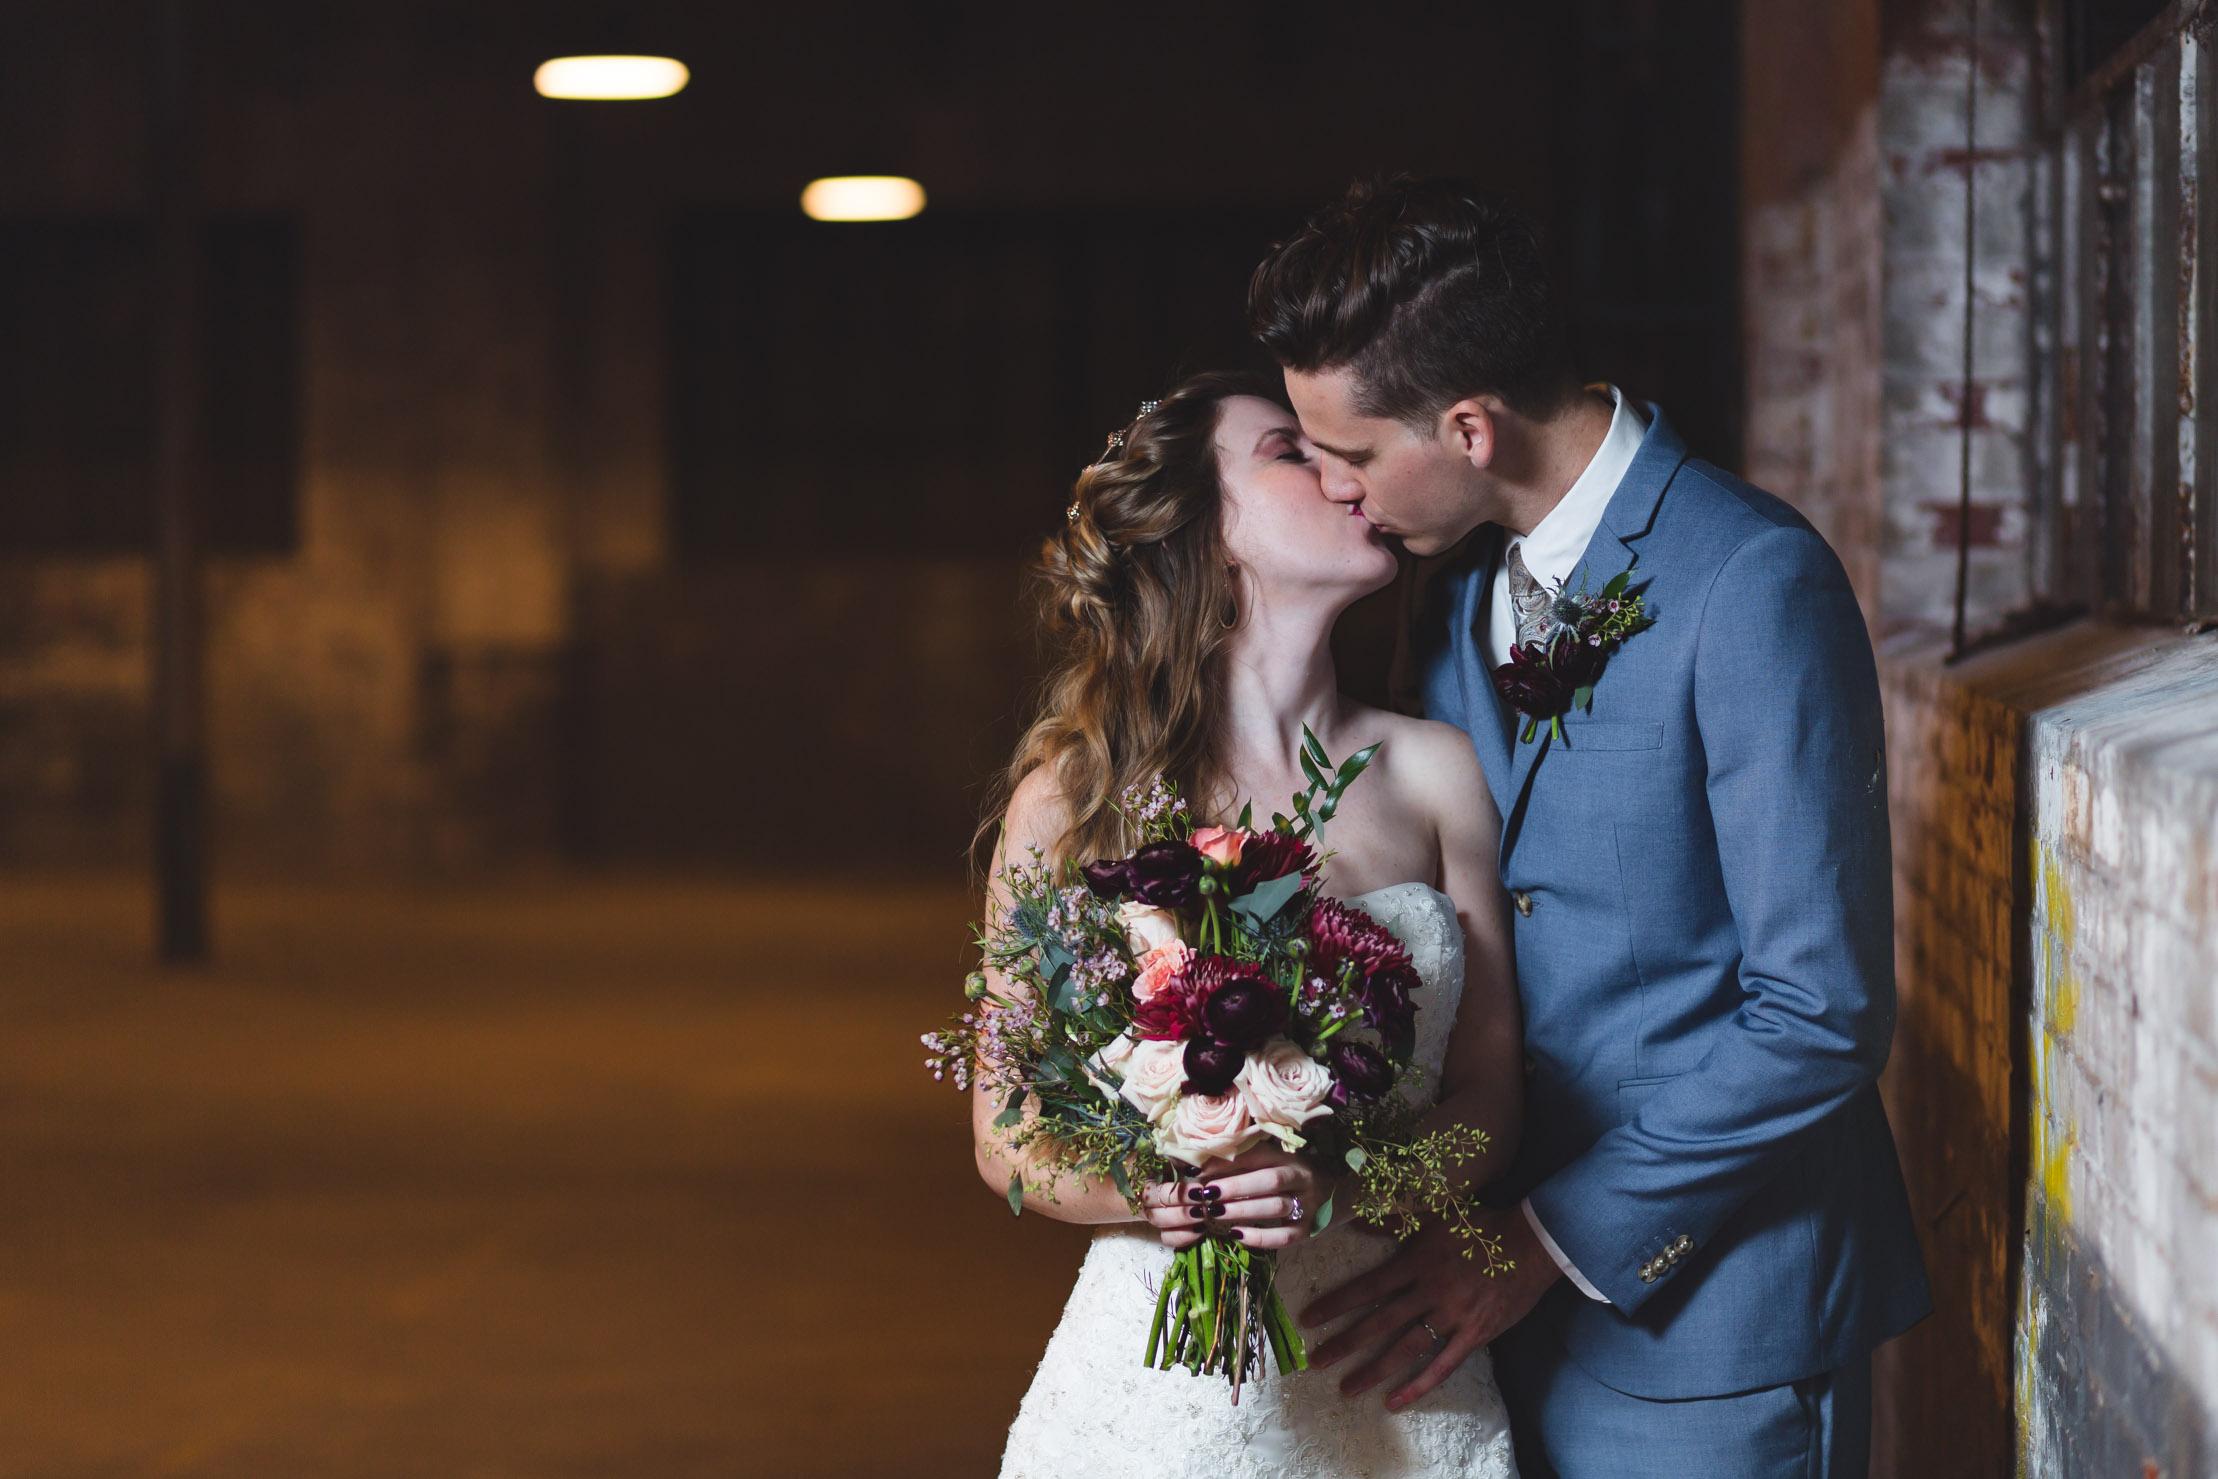 Adam-Szrmack-The-Glass-Factory-Wedding-124.jpg